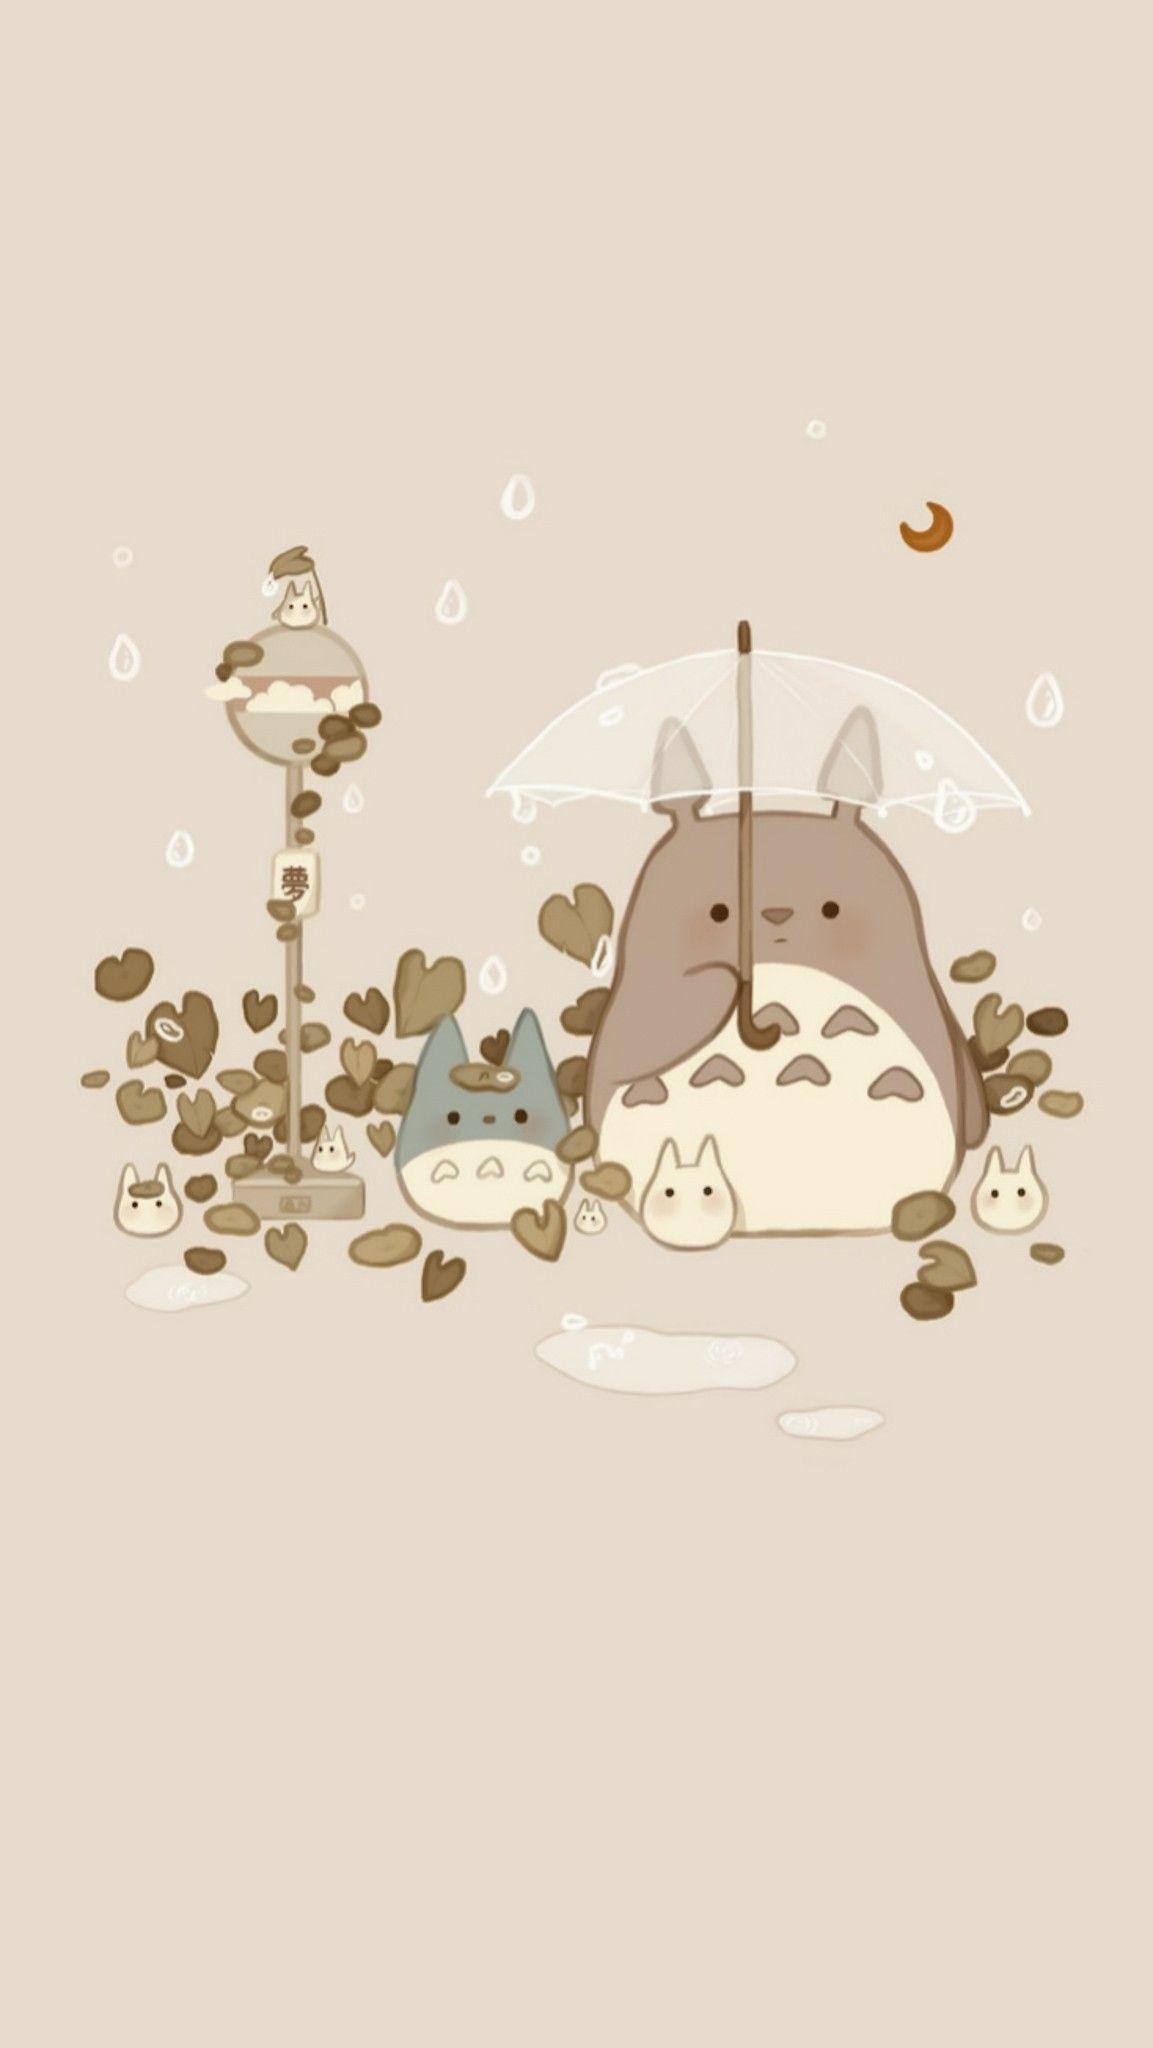 Pin By Aekkalisa On Totoro In 2020 Ghibli Artwork Studio Ghibli Fanart Anime Wallpaper